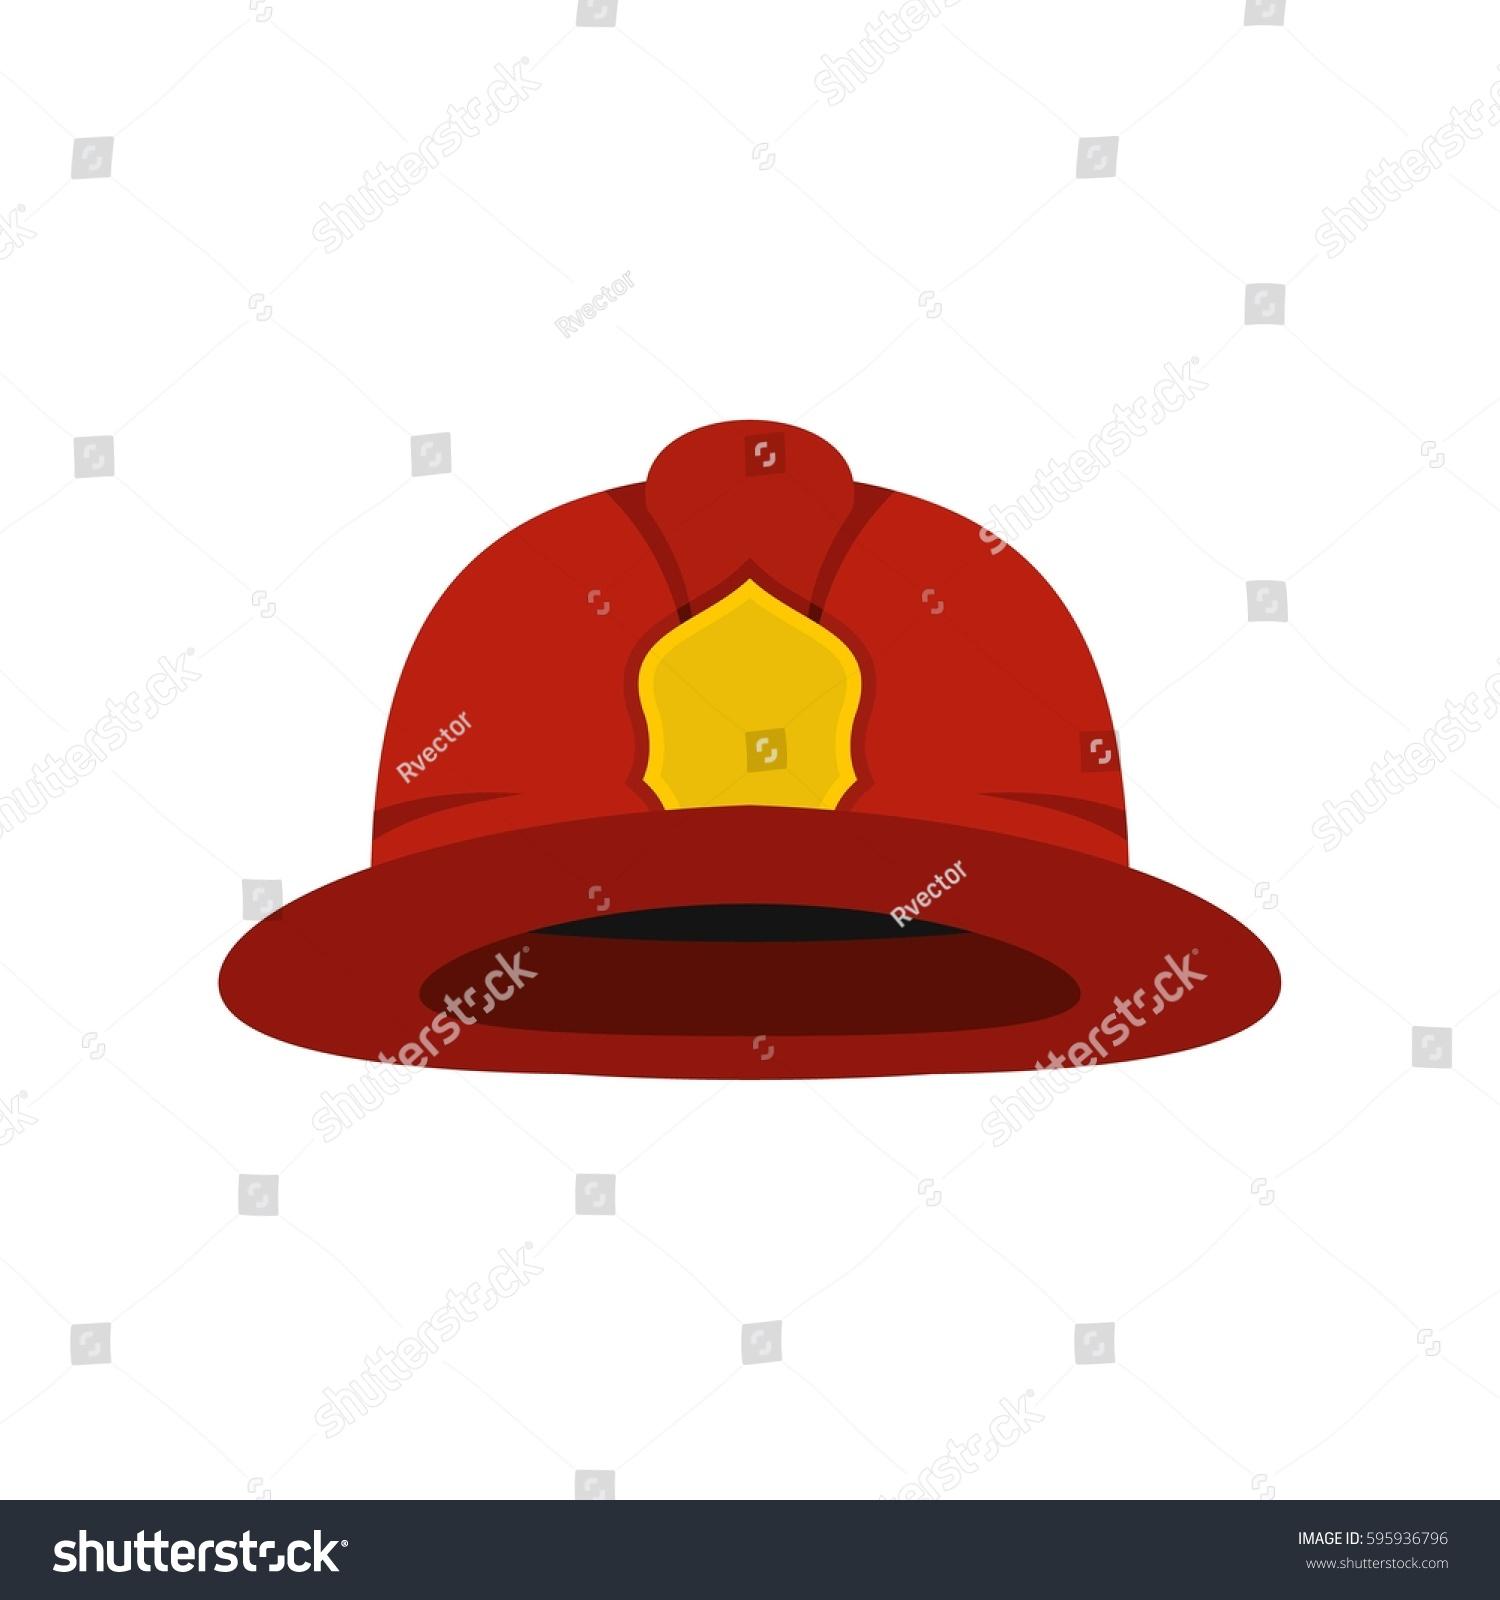 red fireman helmet icon flat illustration stock vector 595936796